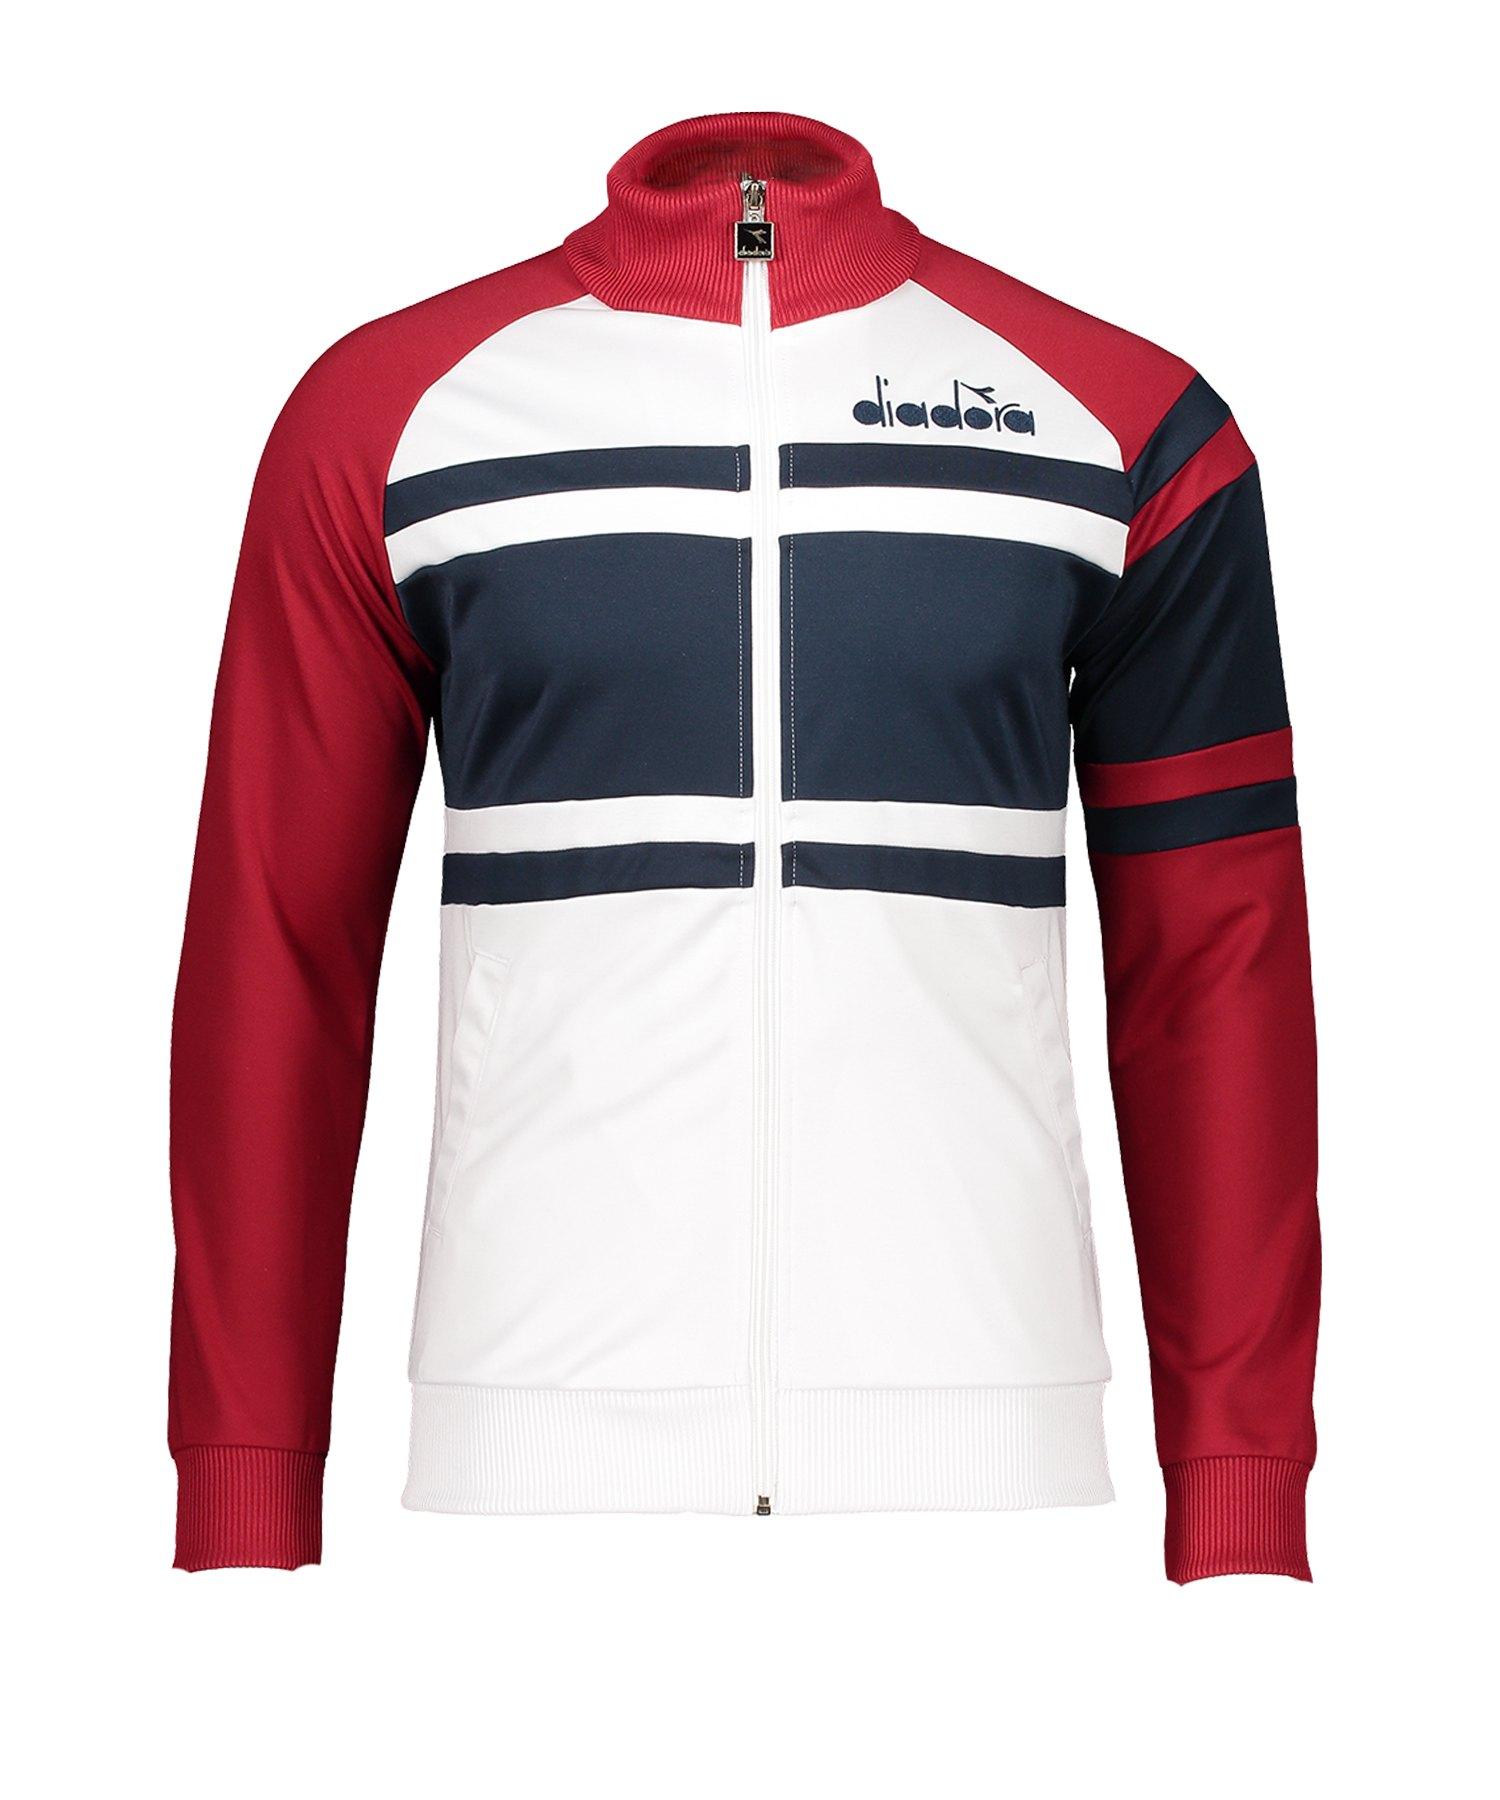 Diadora Jacket 80s Freizeitjacke Rot F45066 - rot